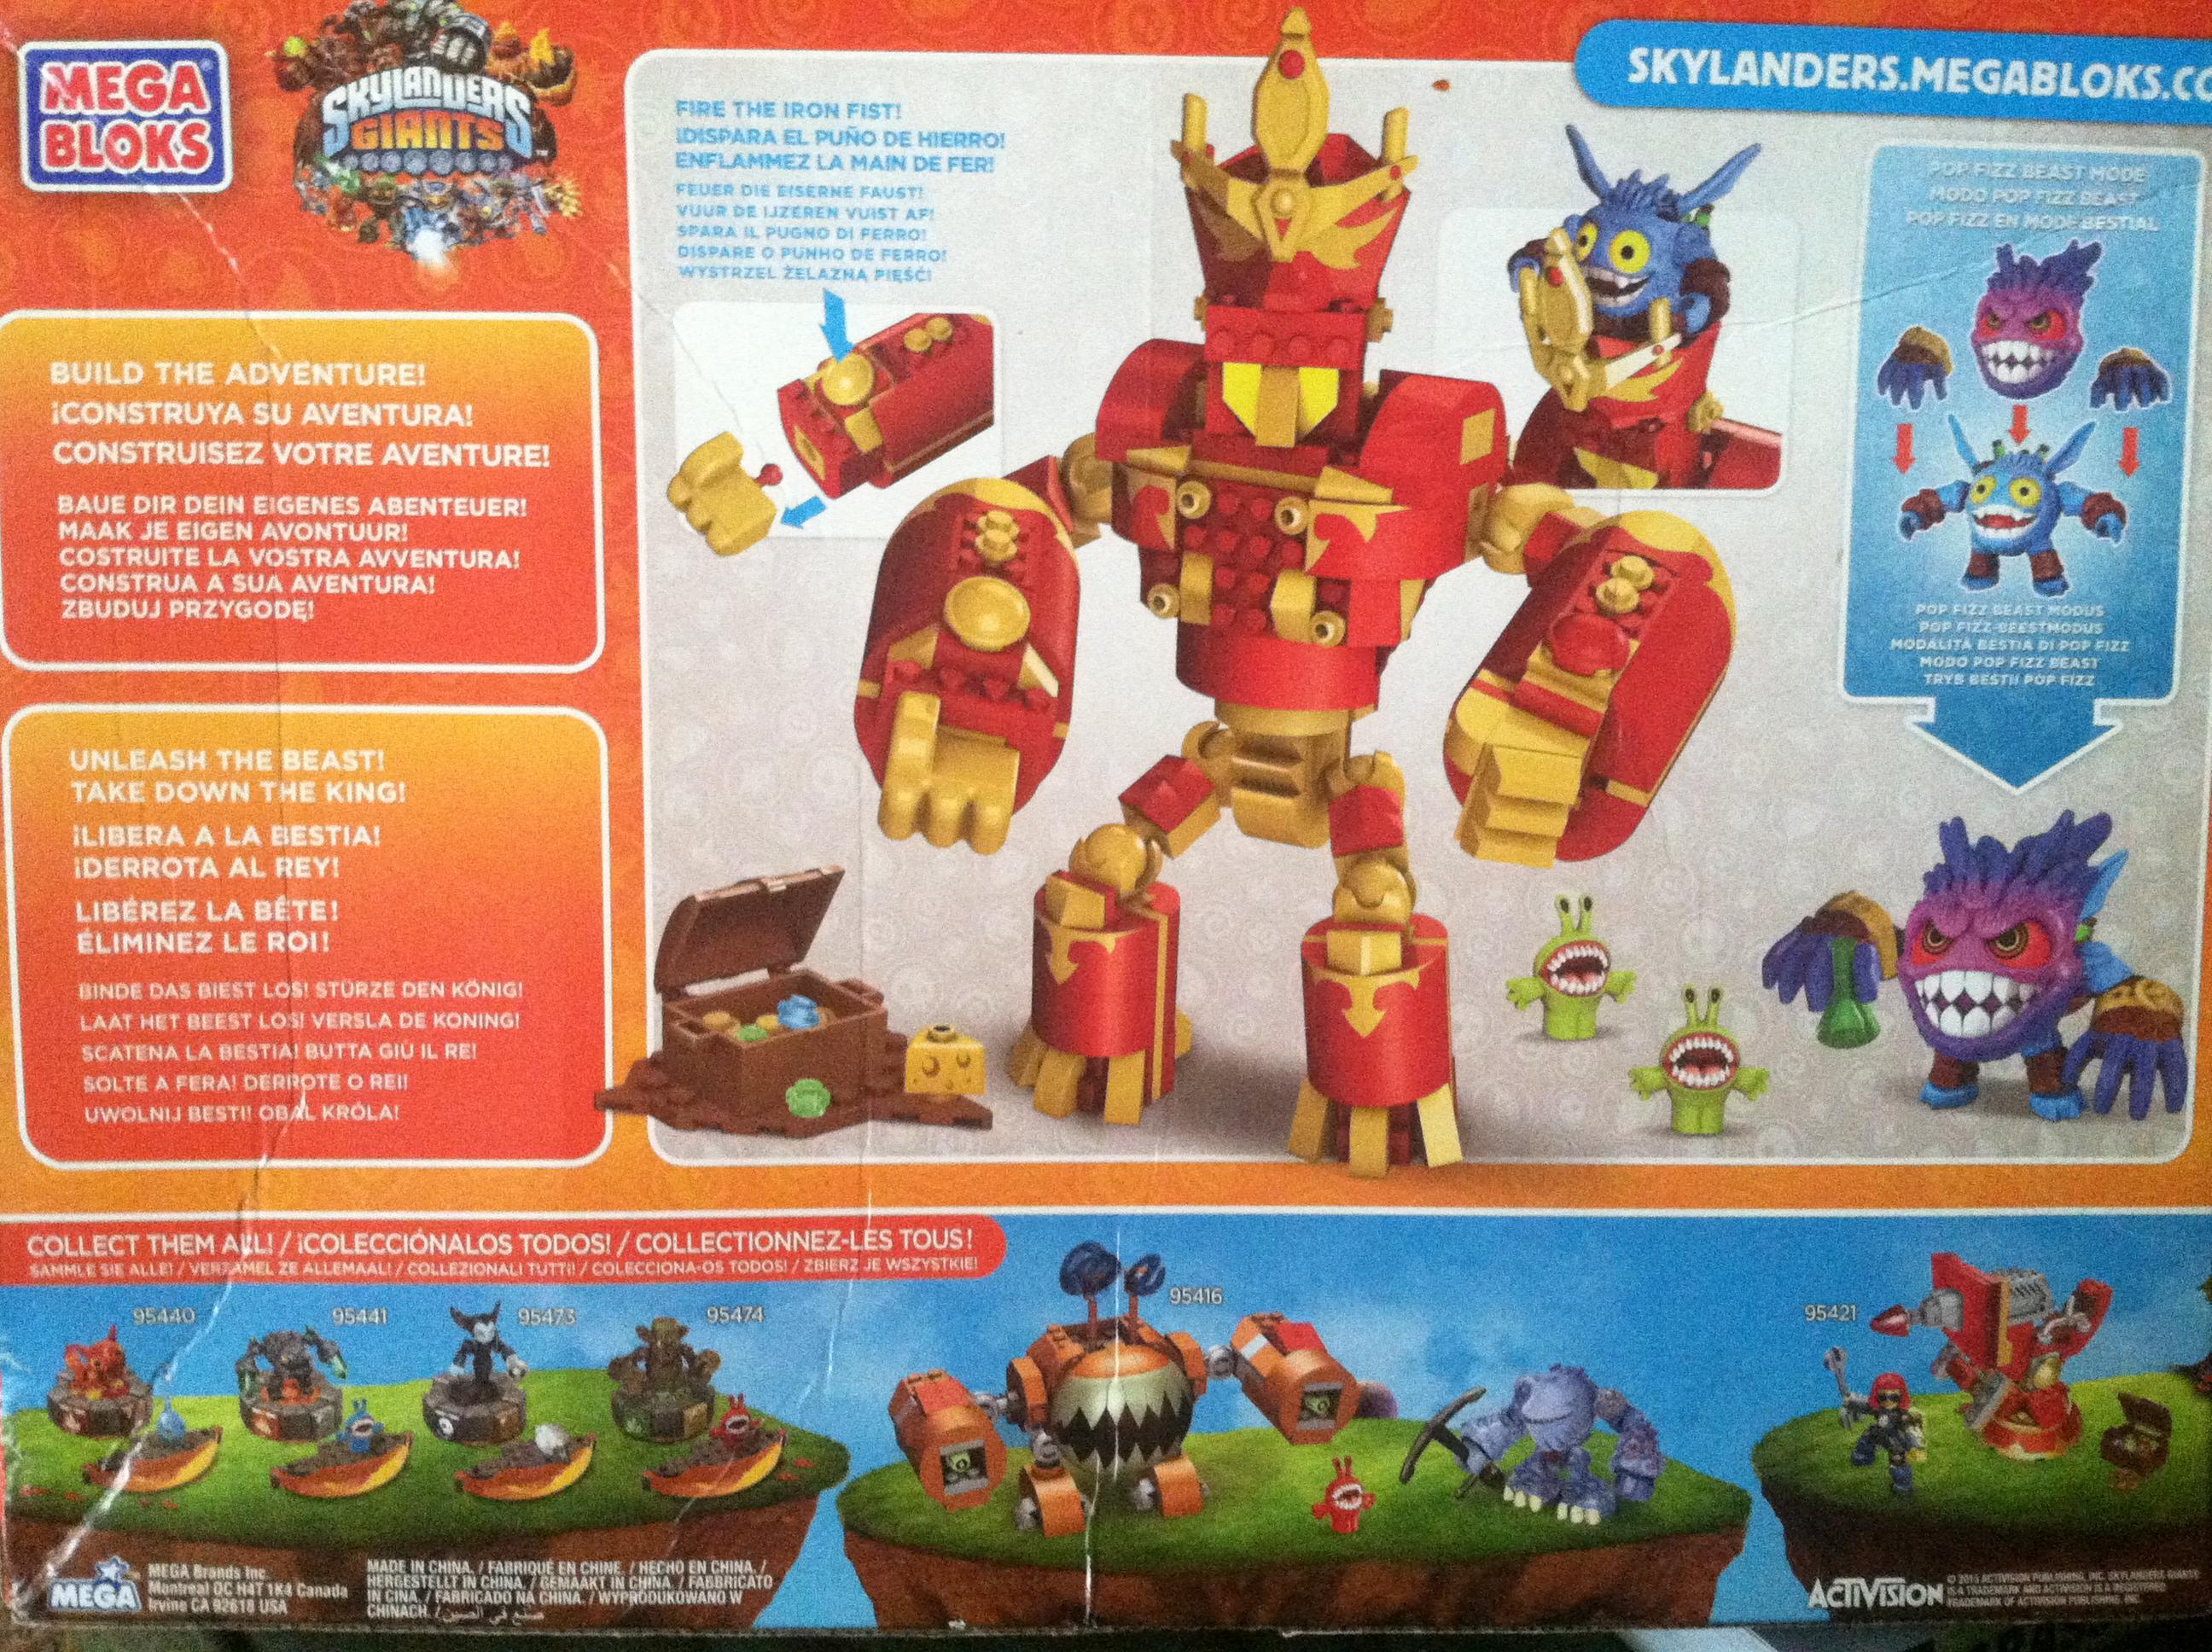 Mega Bloks Skylanders Giant 2